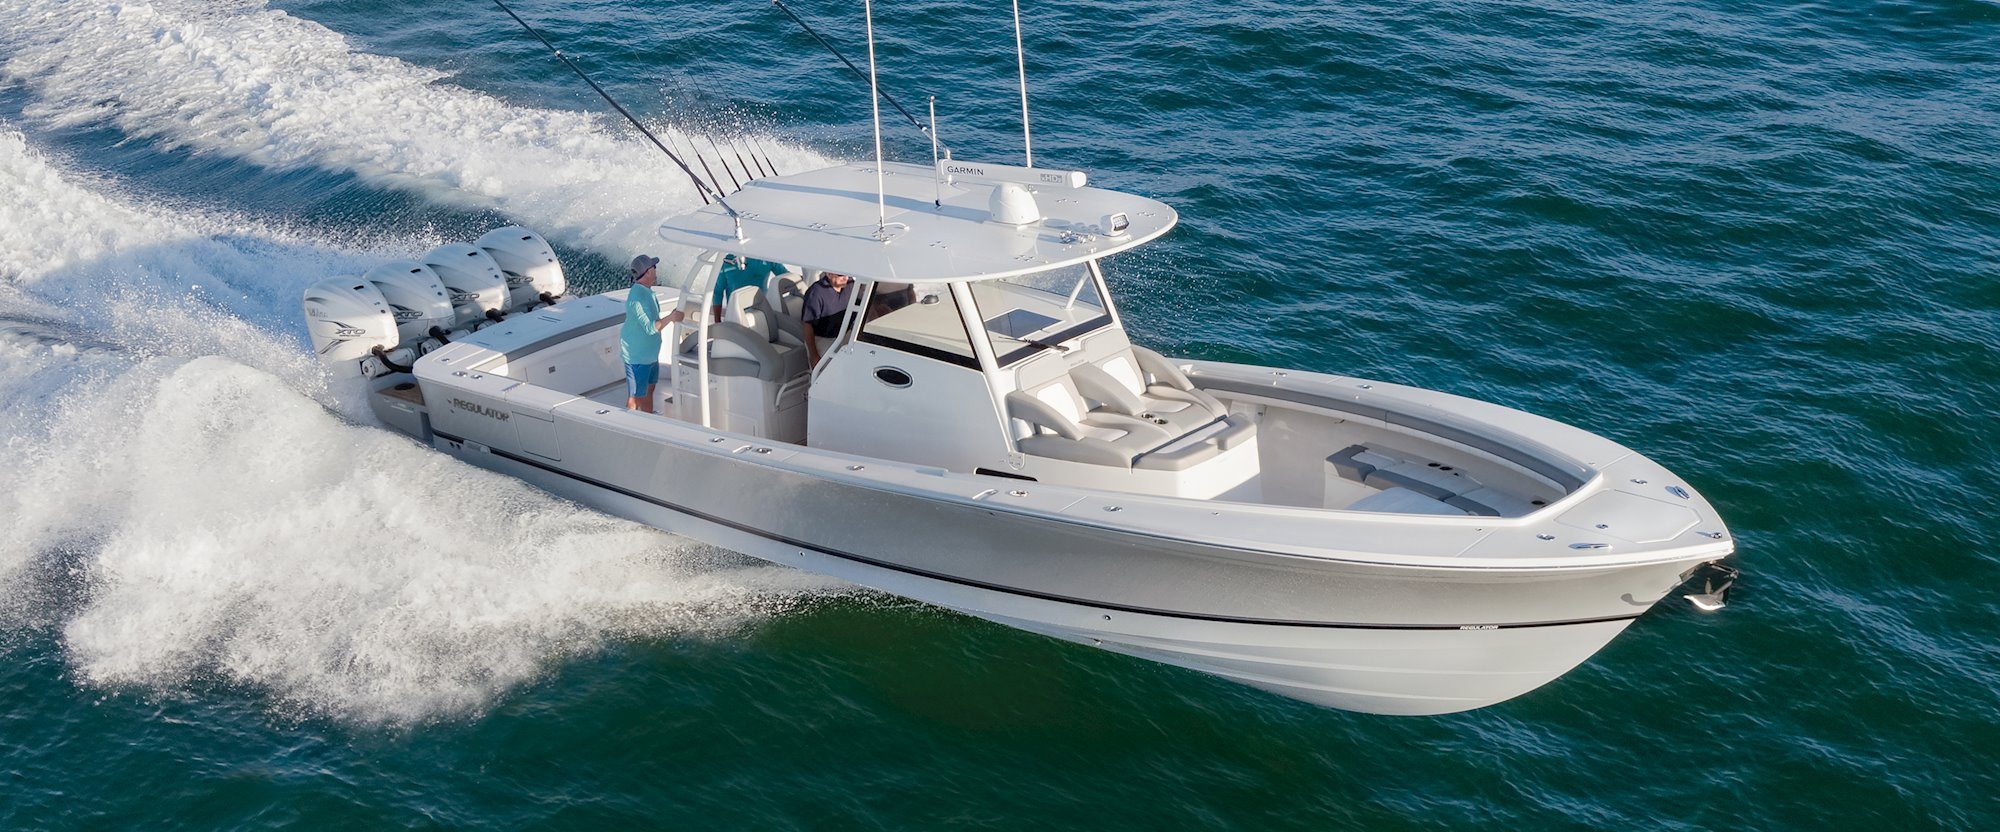 Regulator Yachts Full Screen Picture